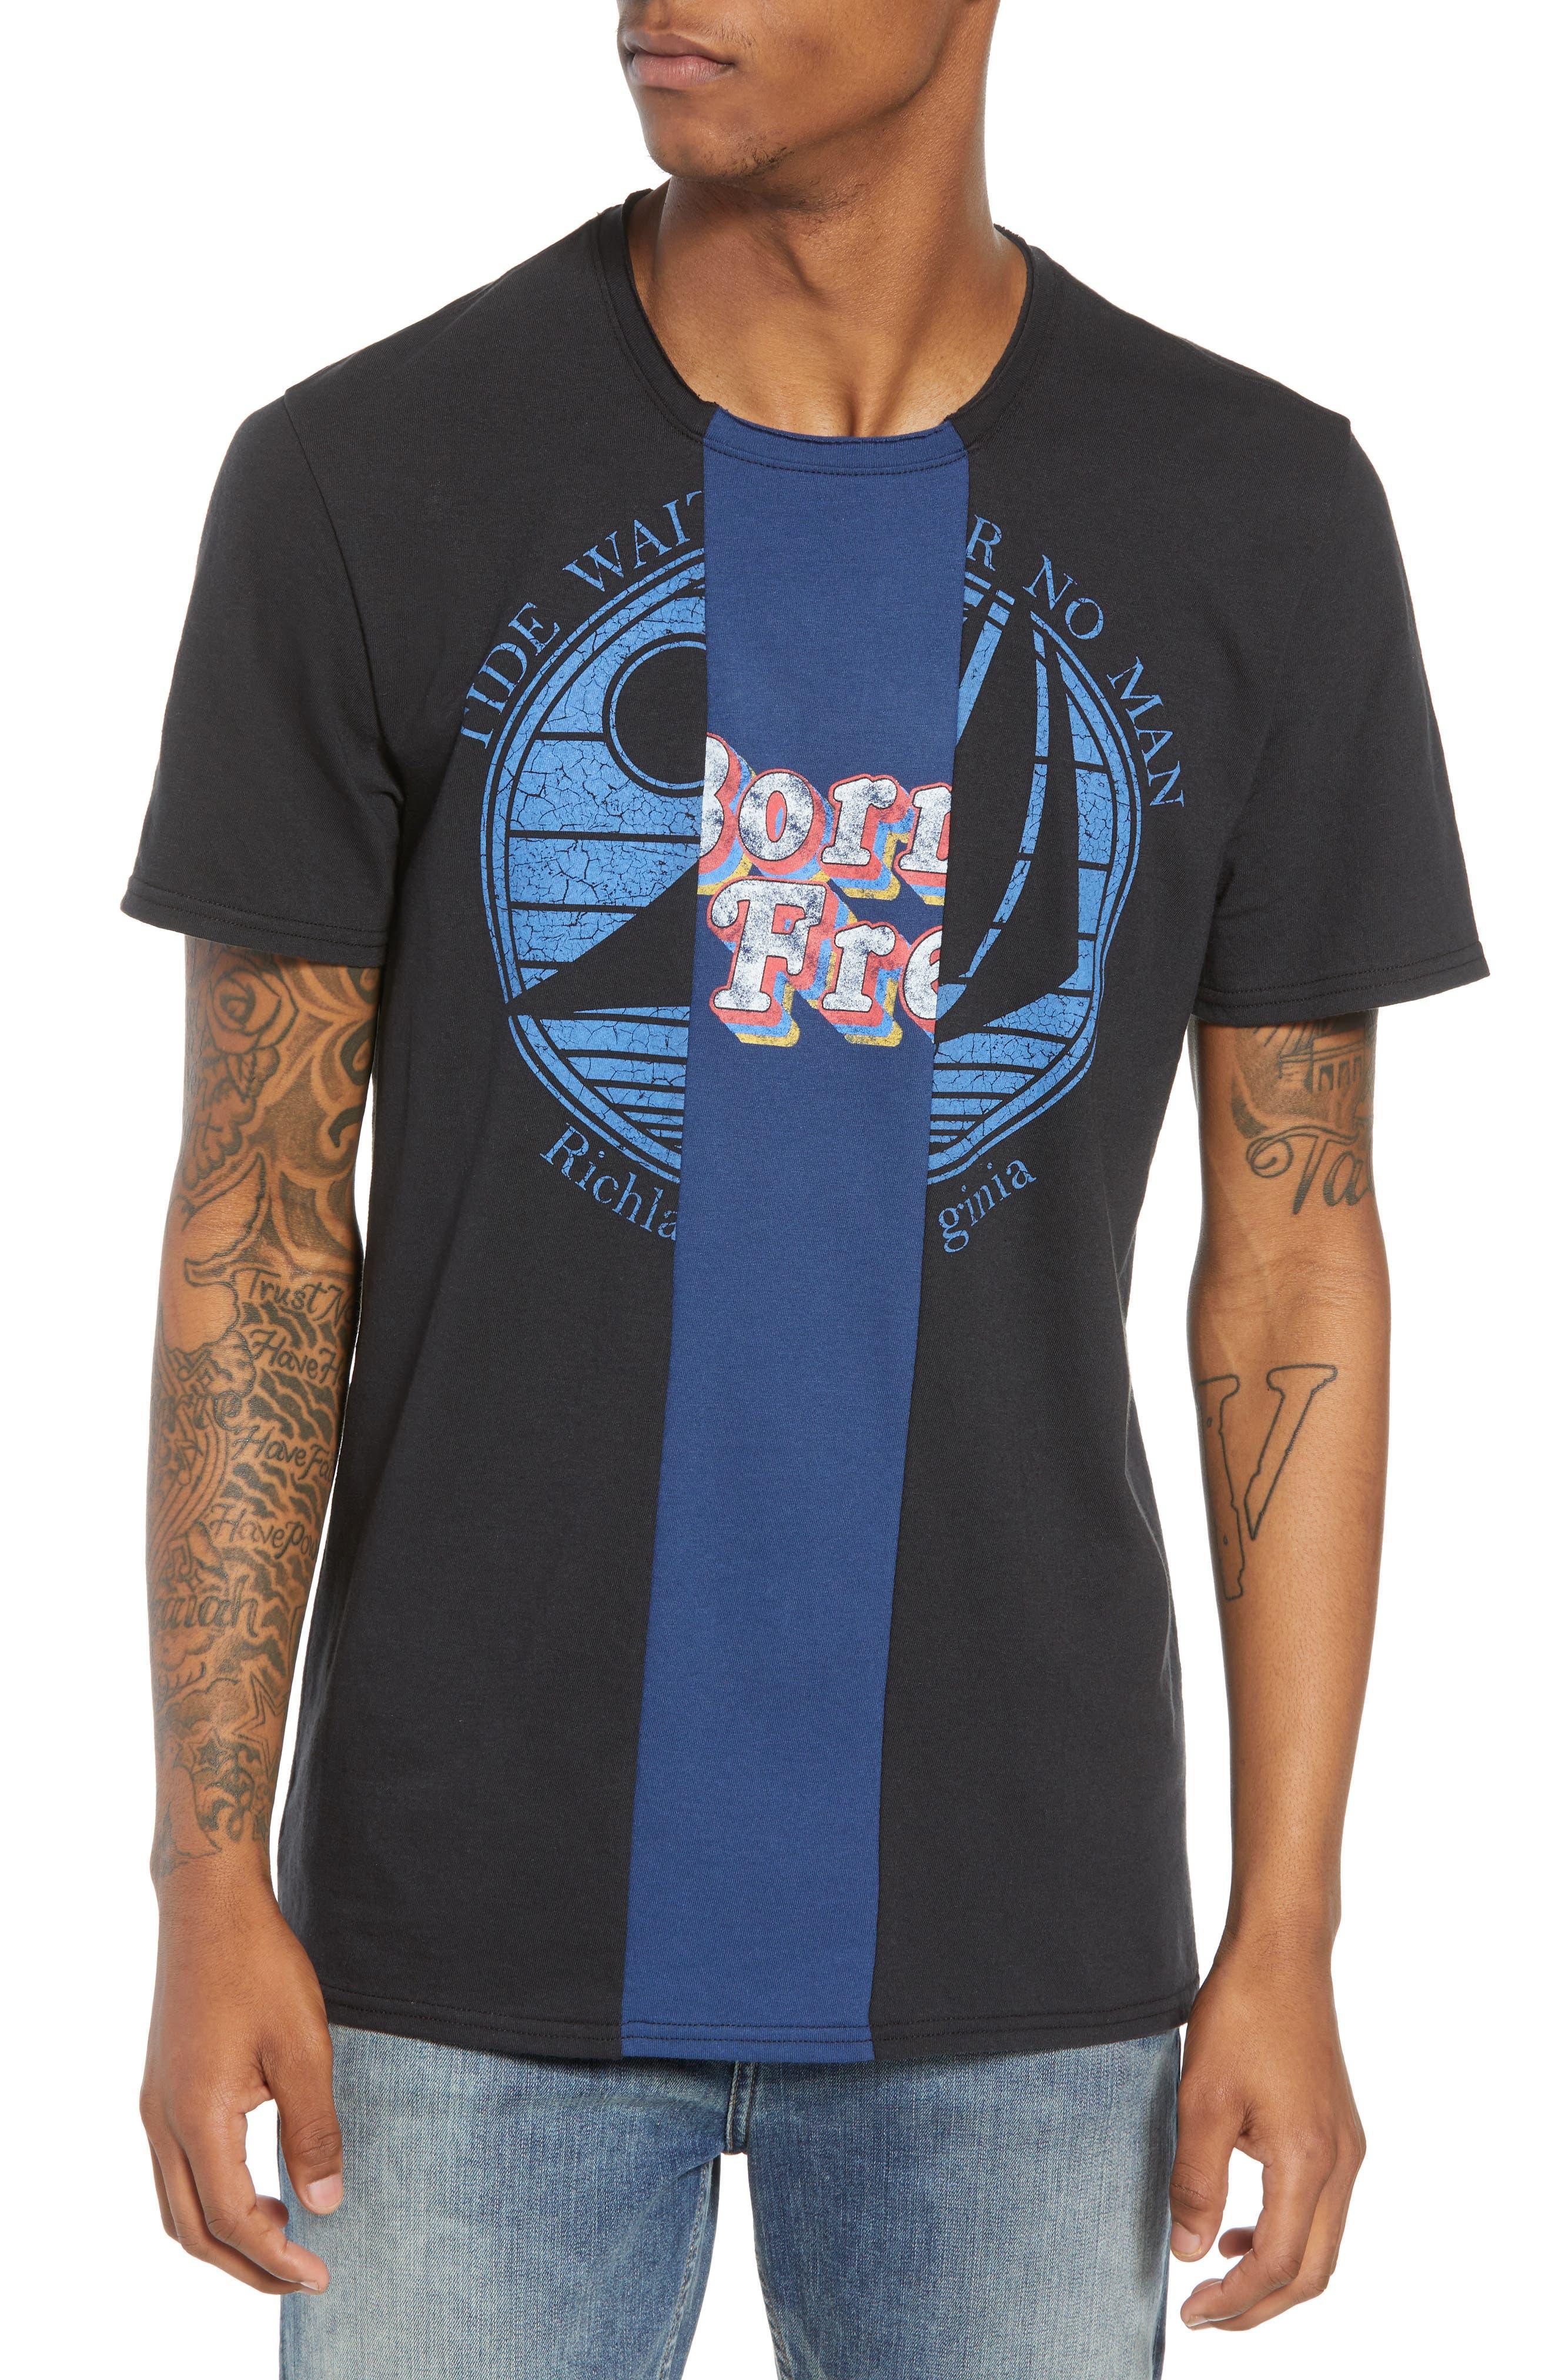 Tri-Splice T-Shirt,                             Main thumbnail 1, color,                             BLACK NAVY SKI SPLICE